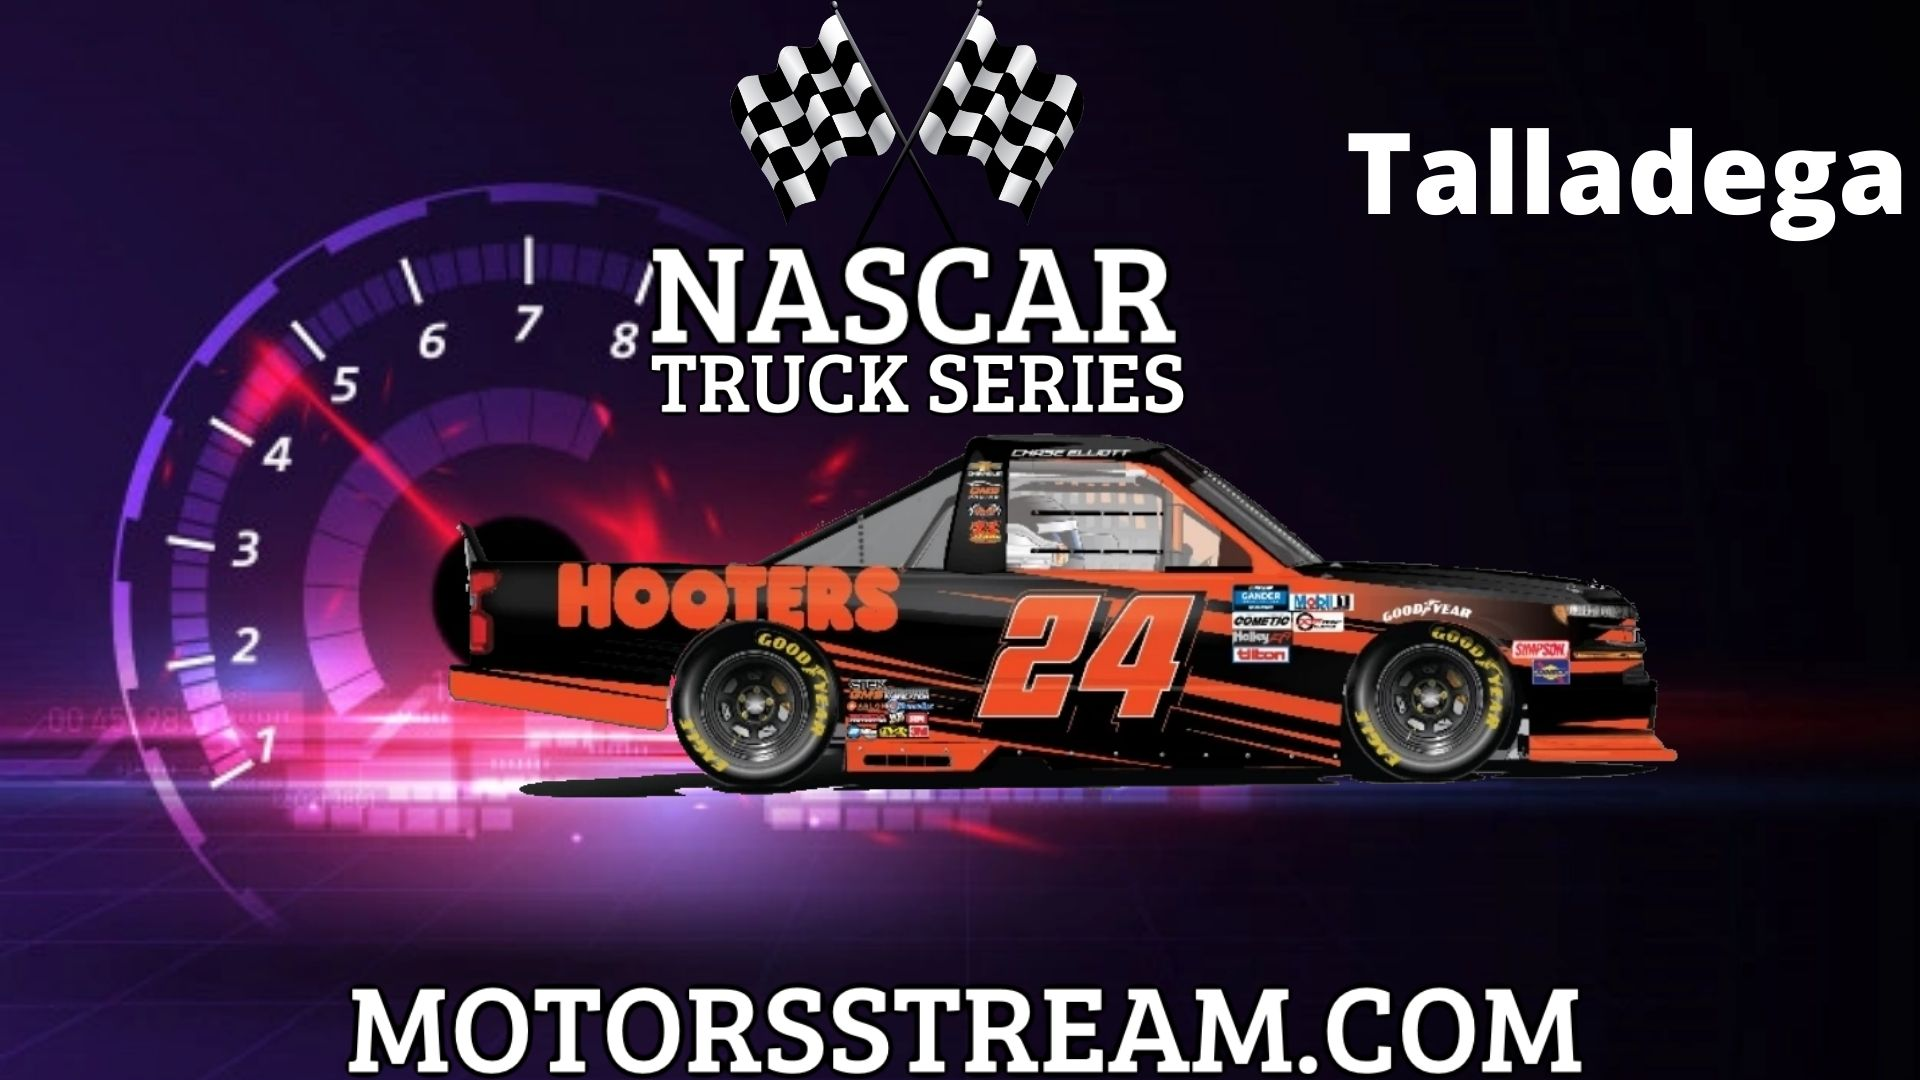 NASCAR Truck Series Playoff Race at Talladega Live Stream